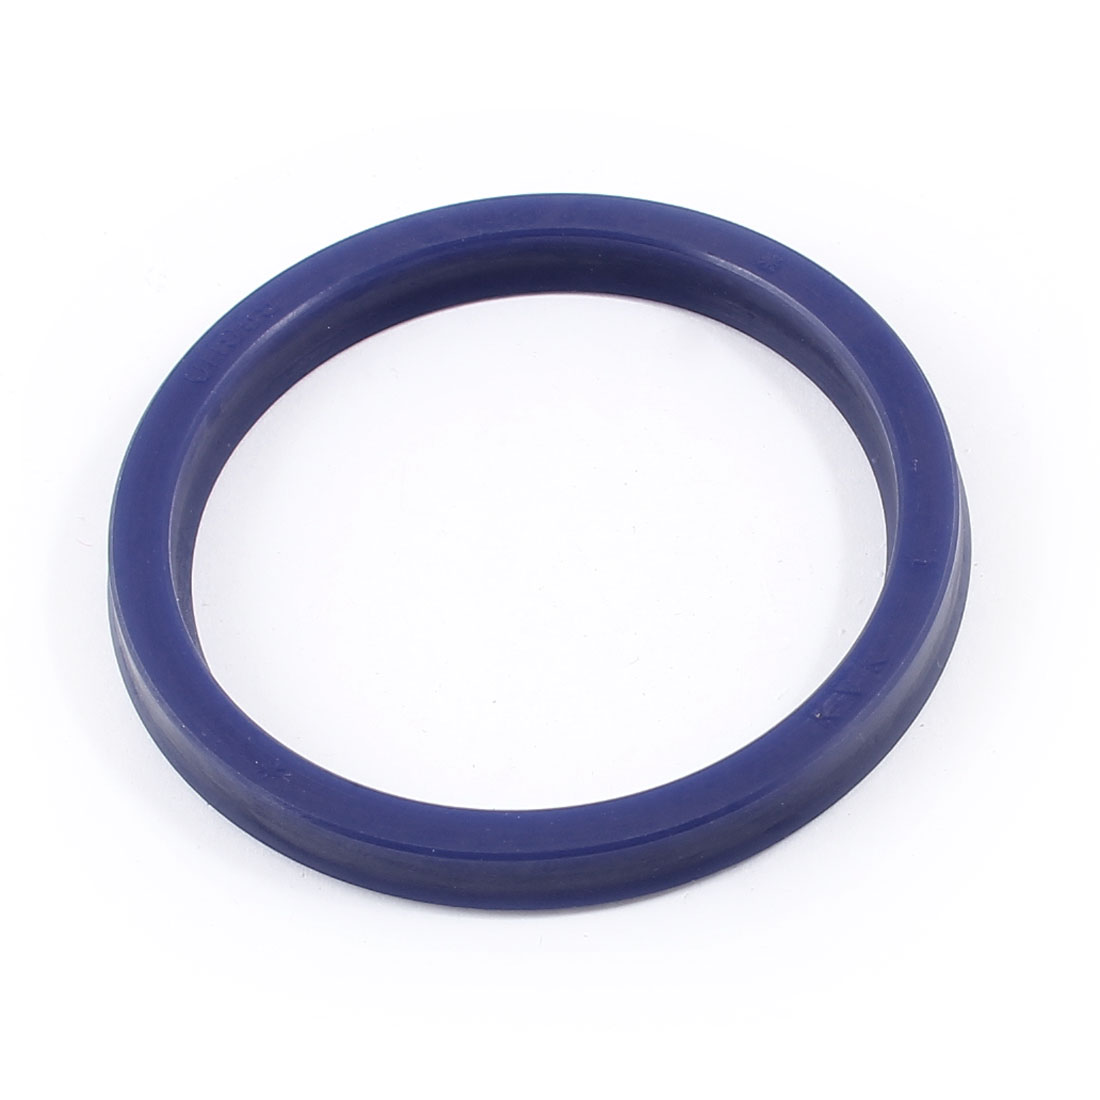 Blue 65mm x 53mm x 6mm Grooving Rubber O Ring Skeleton Oil Seal Gasket